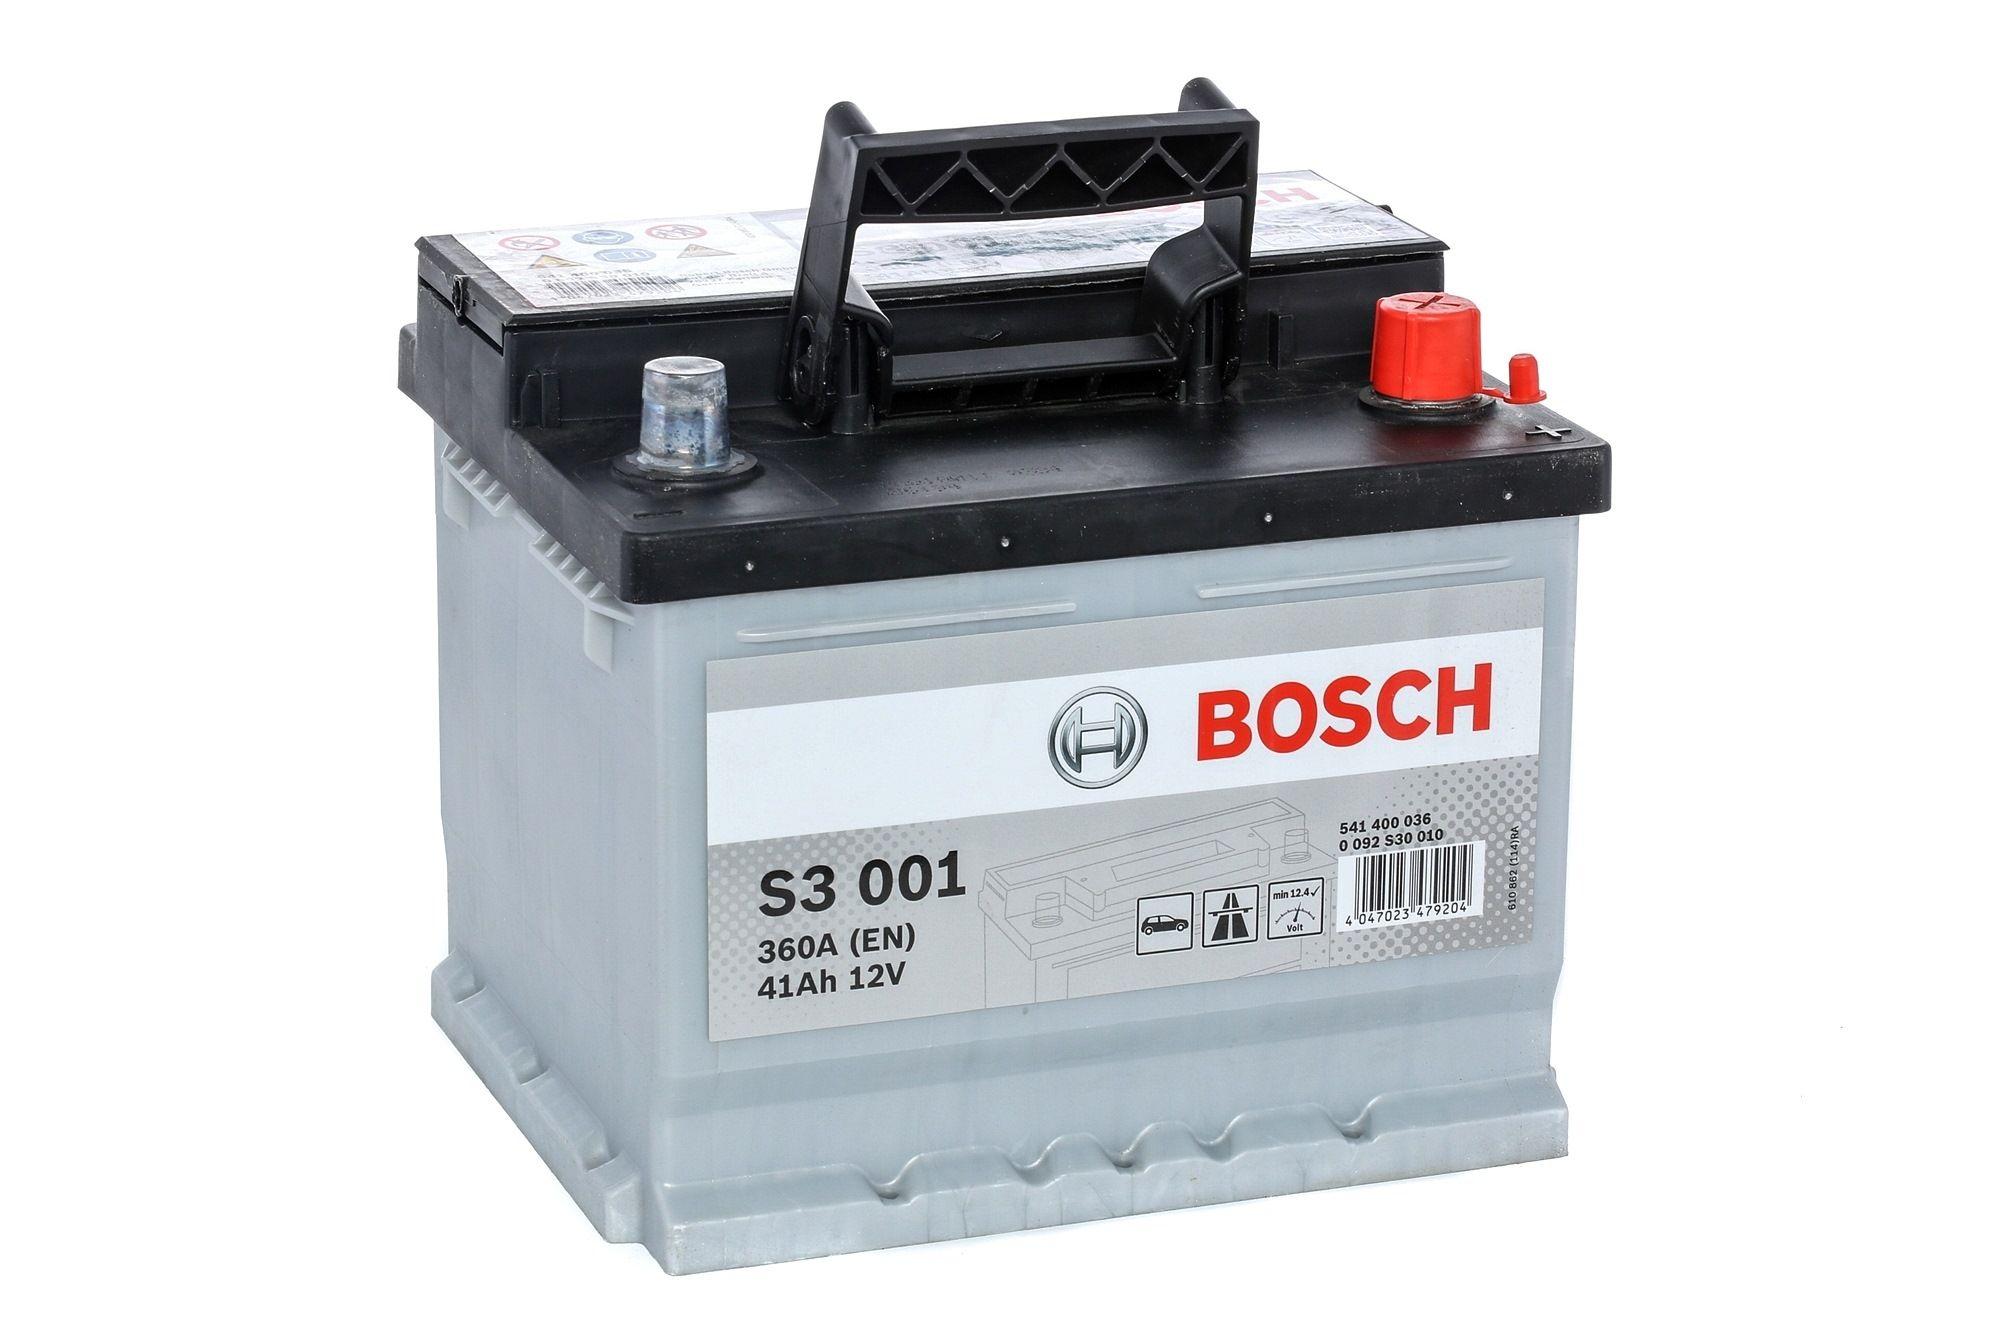 BOSCH: Original Kfz-Elektrik 0 092 S30 010 (Kälteprüfstrom EN: 360A, Spannung: 12V)